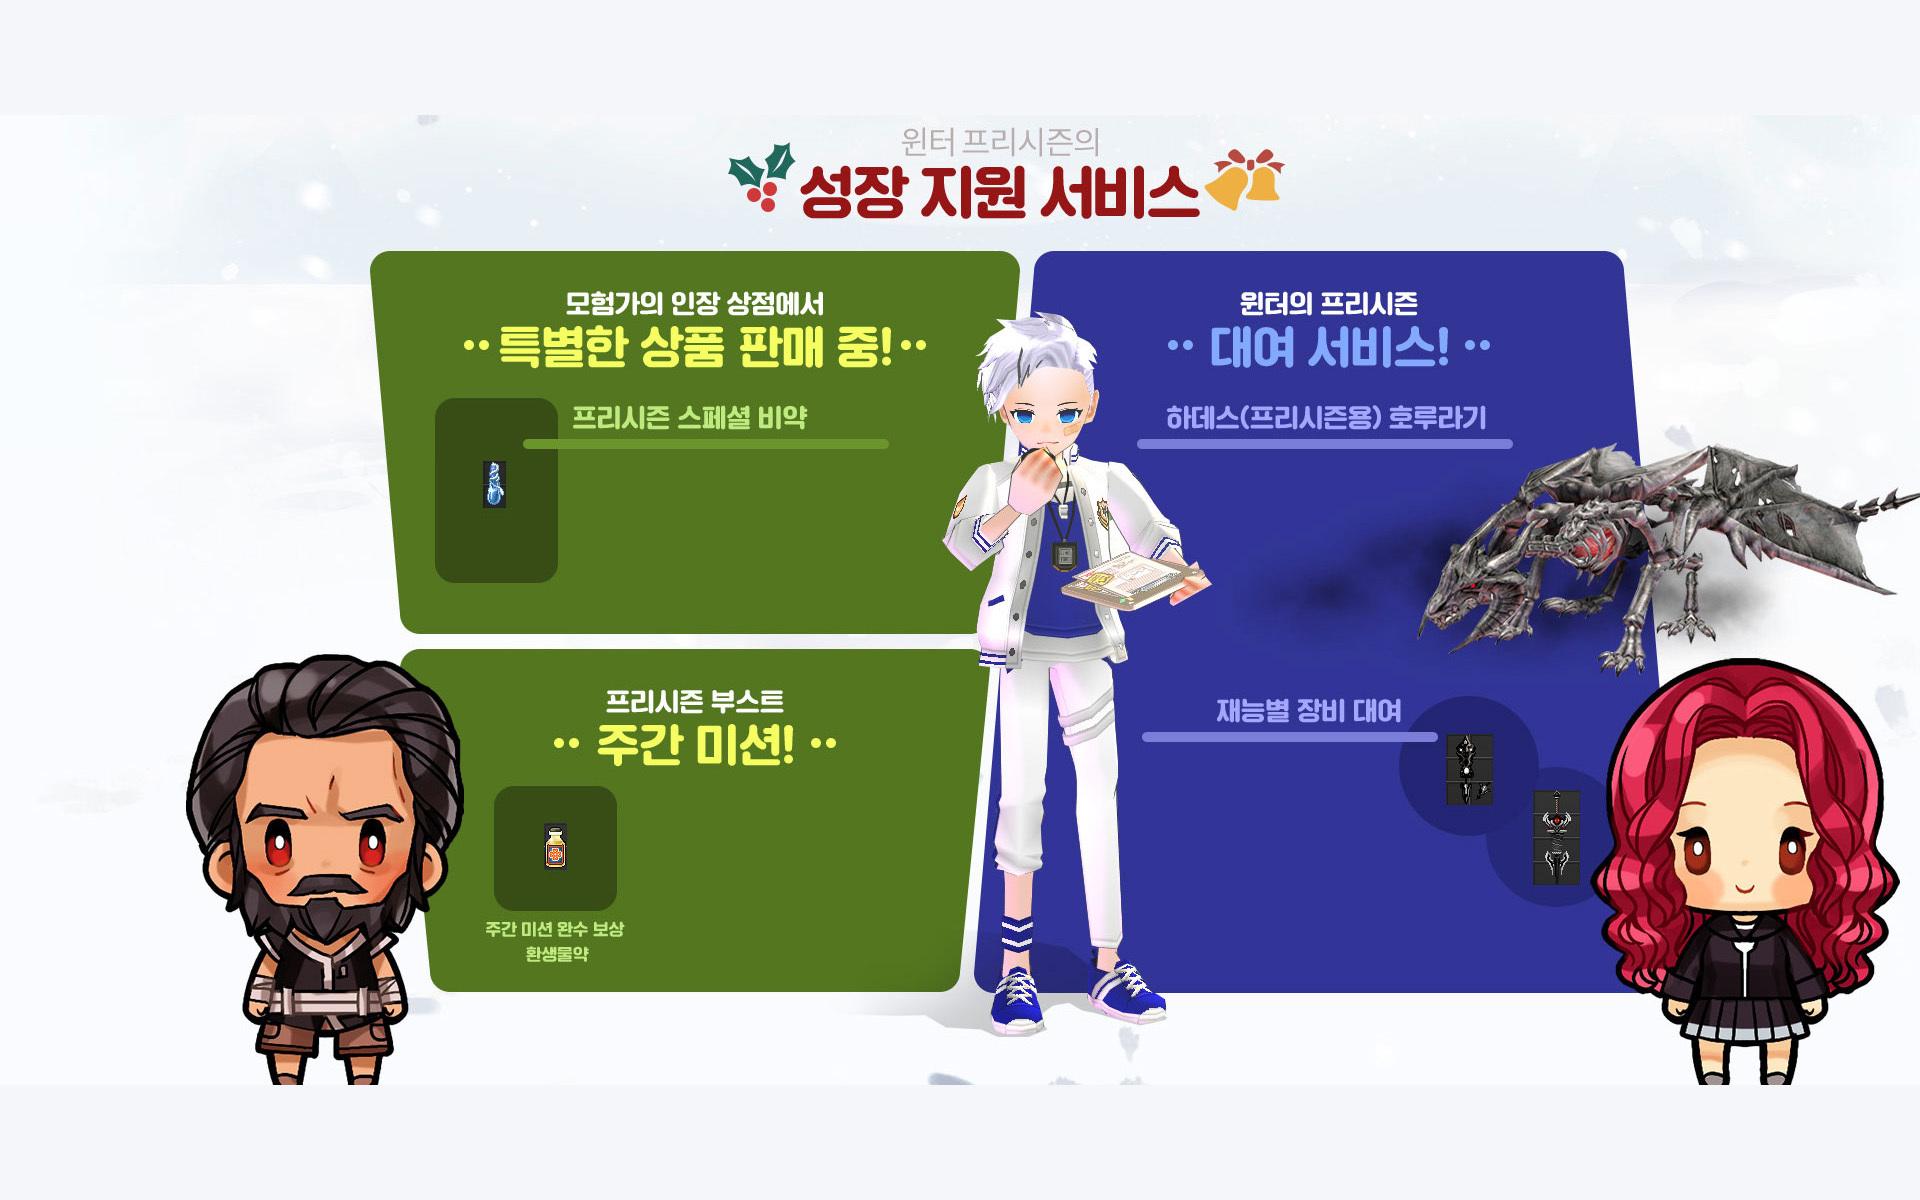 韓国201901-E